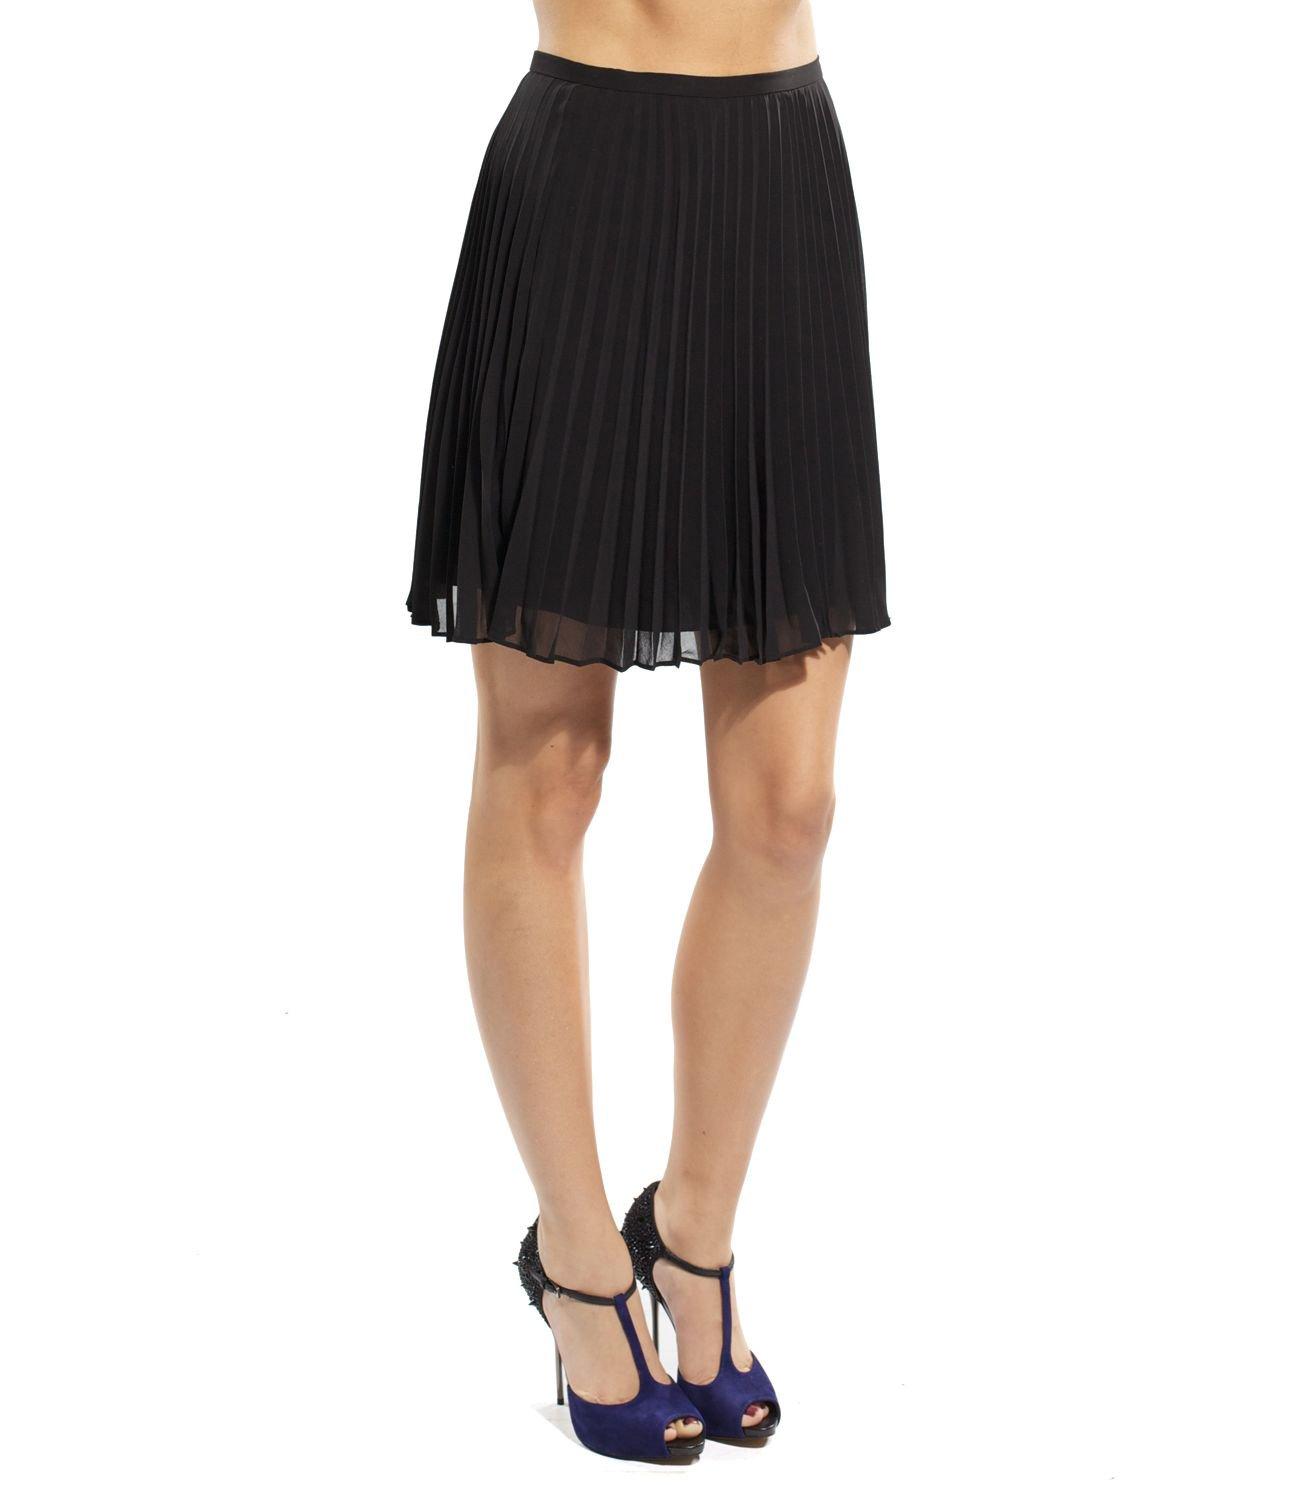 Halston Heritage Short Pleated Skirt For Women In Black, 4